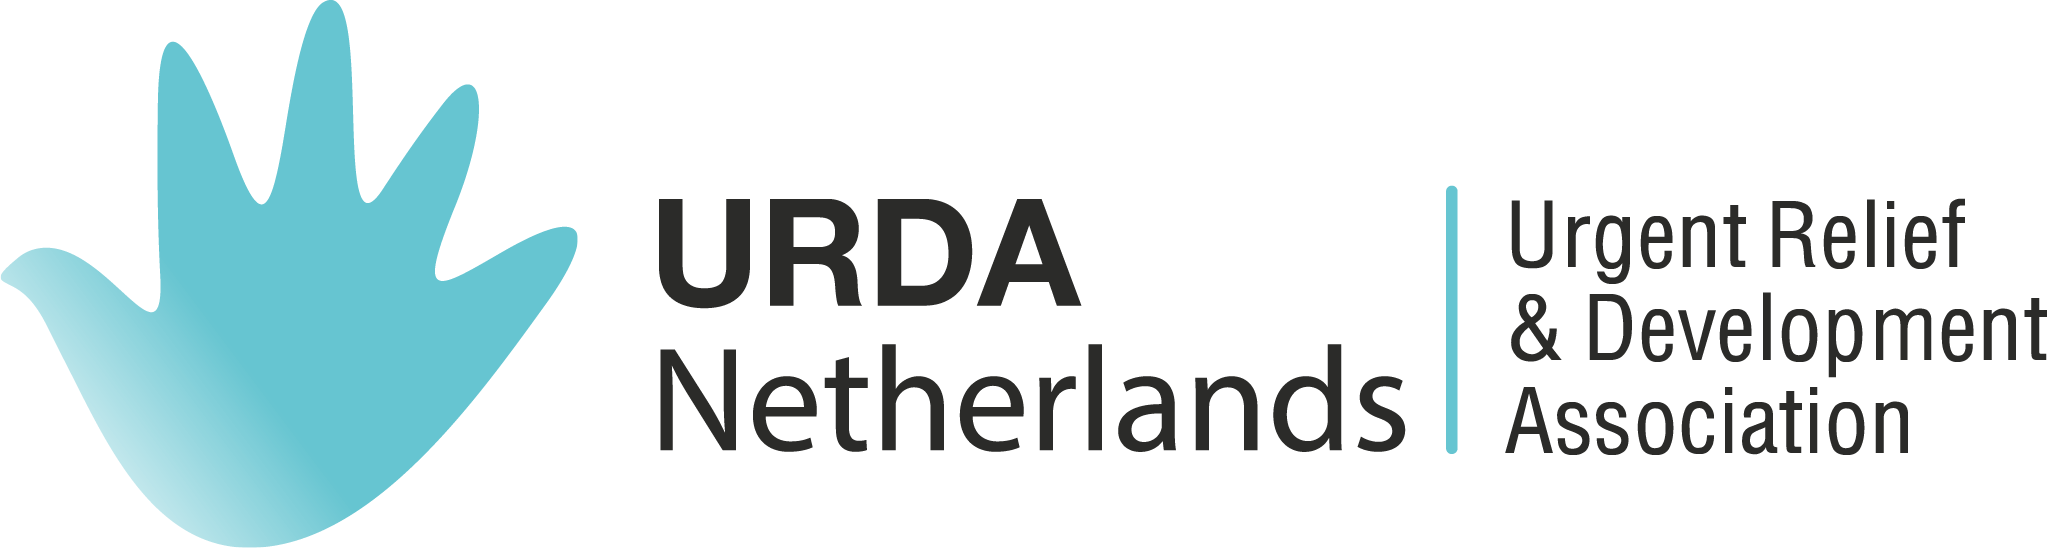 Stichting URDA